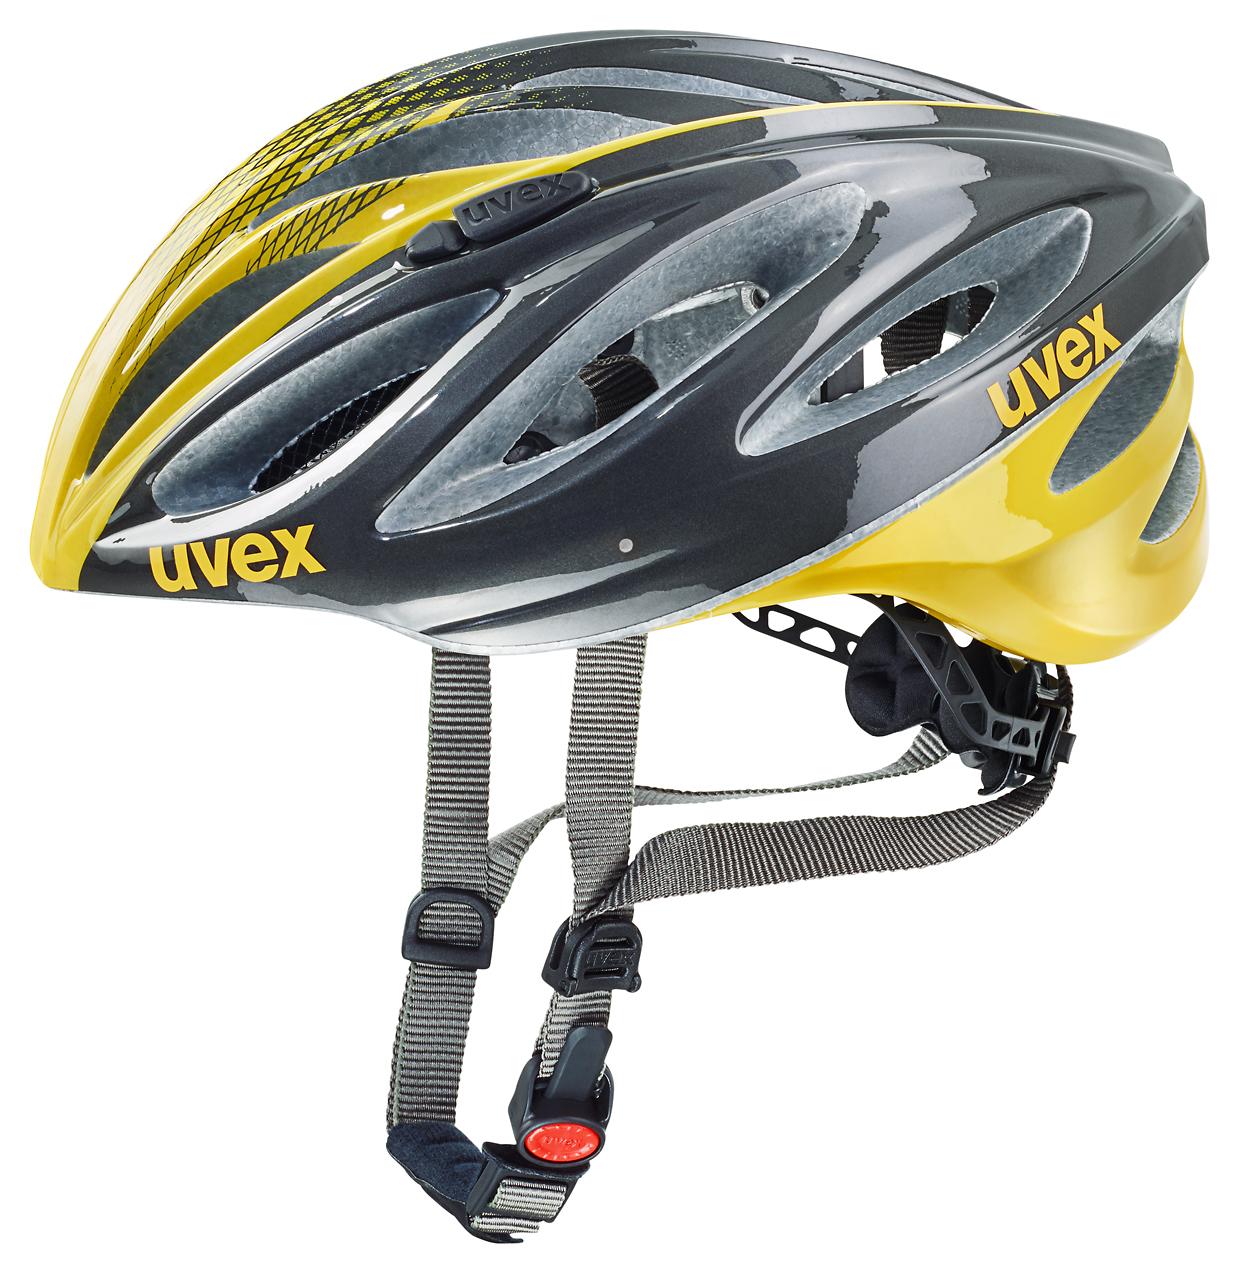 UVEX BOSS RACE, ANTHRACITE-YELLOW 2016 52-56 cm